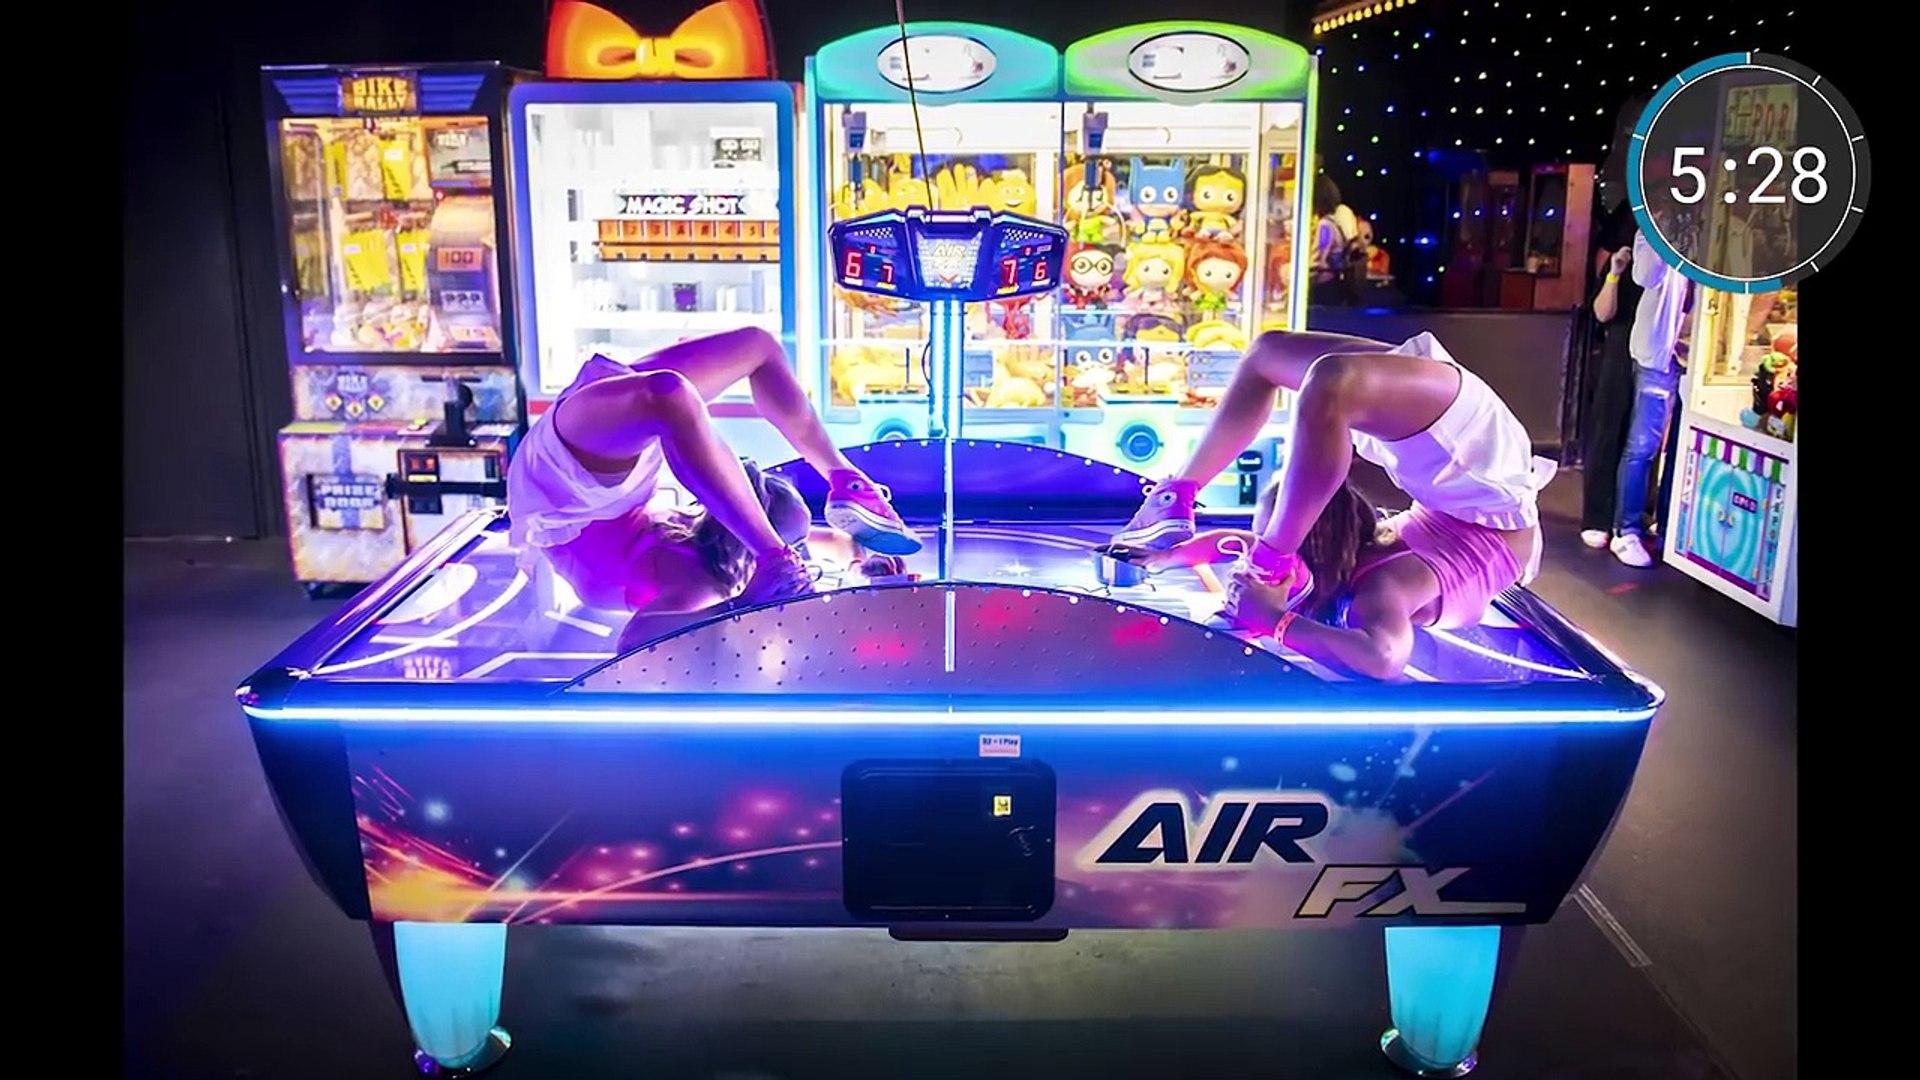 RYBKA TWINS Storm Luna Park for Spectacular 10 Minute Photo 1920x1080